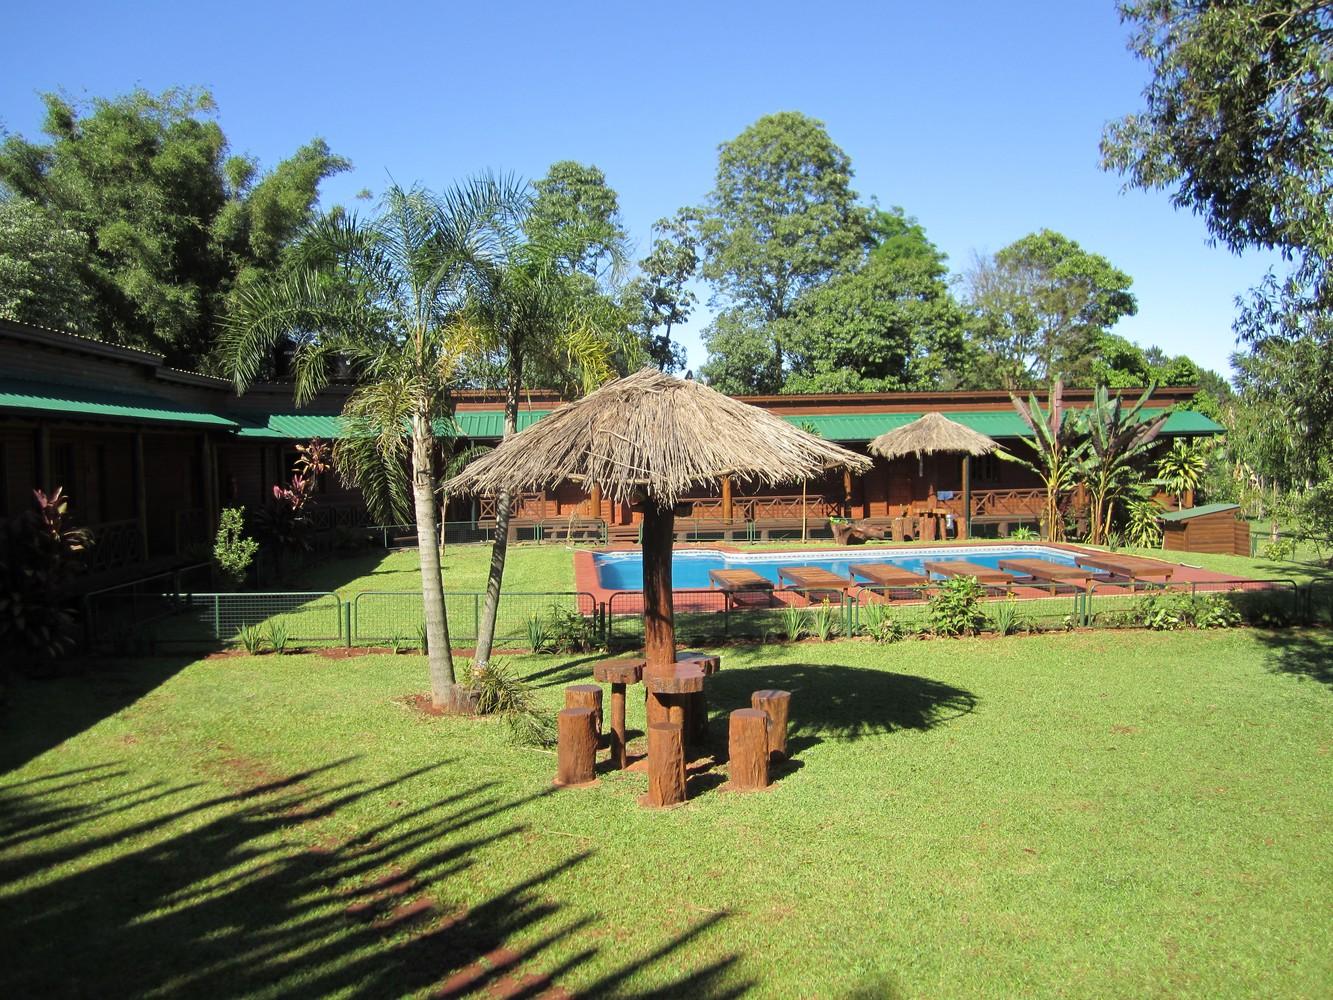 Rio Tropic - Puerto Iguazú